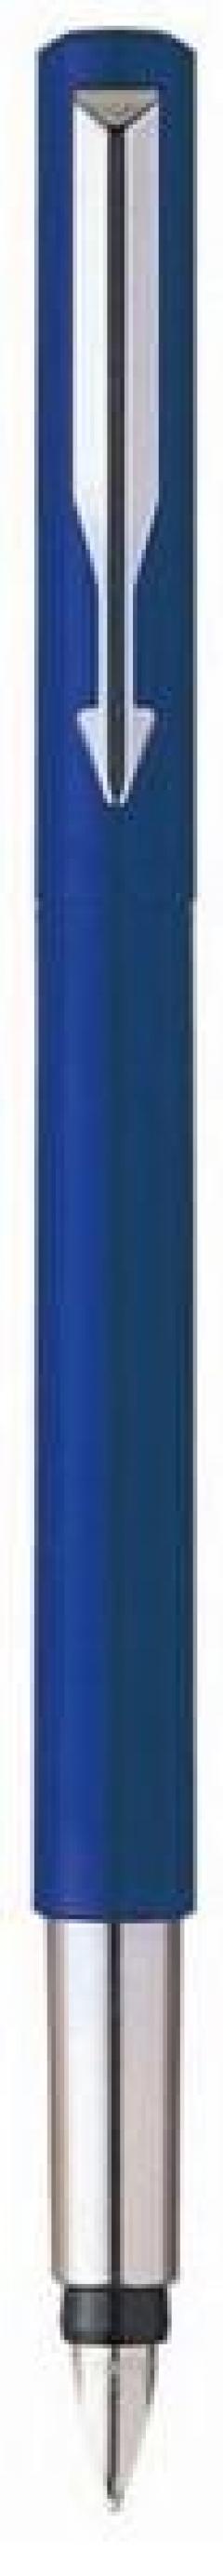 Stilou Parker Vector standard albastru